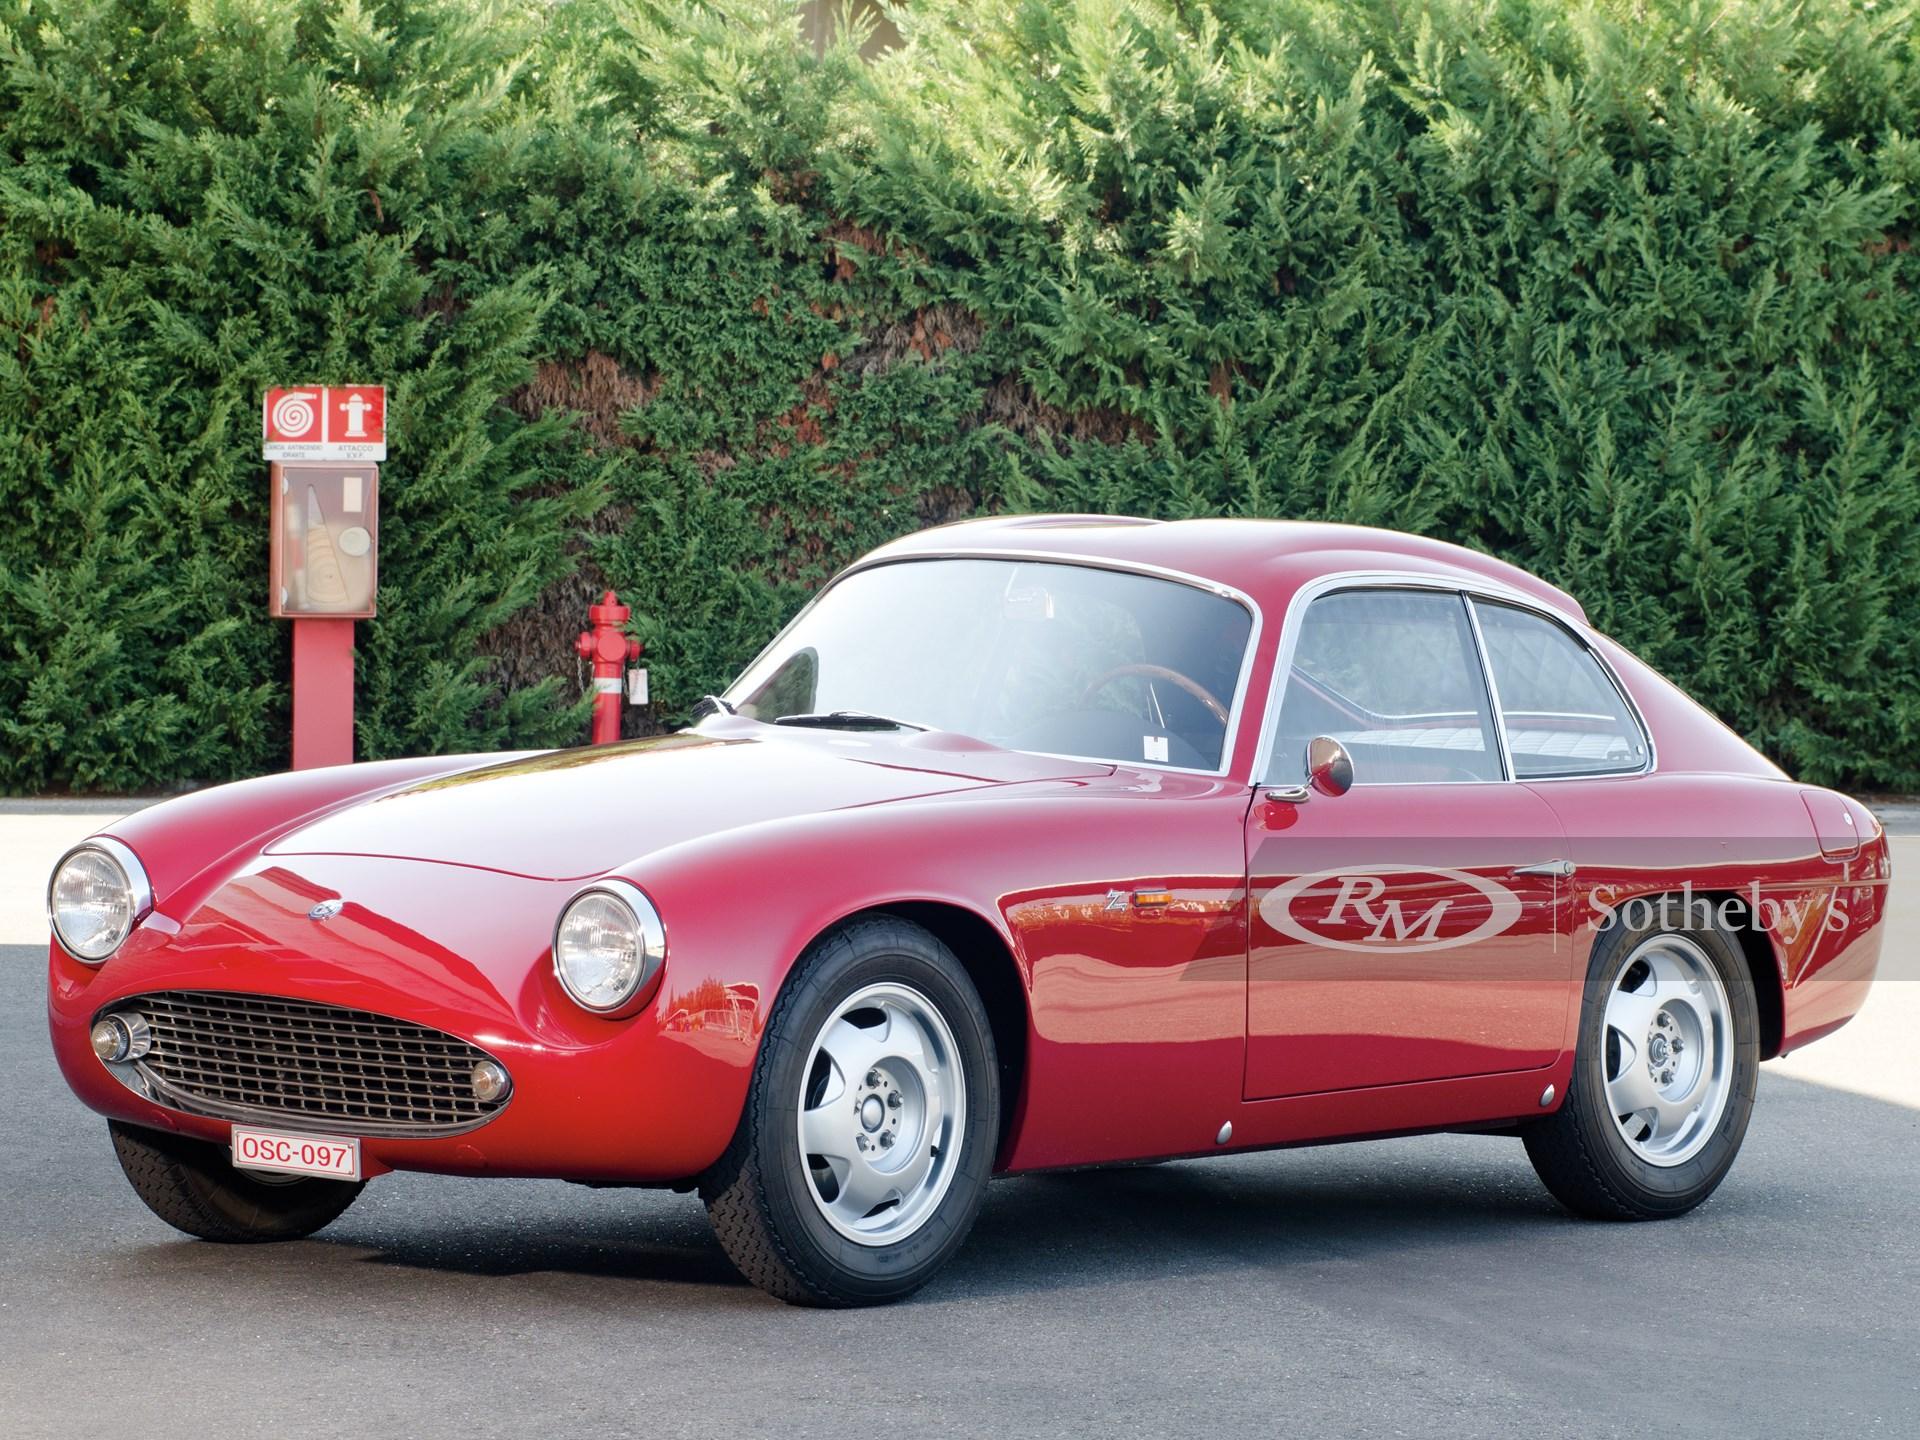 1963 OSCA 1600 GT by Carrozzeria Zagato